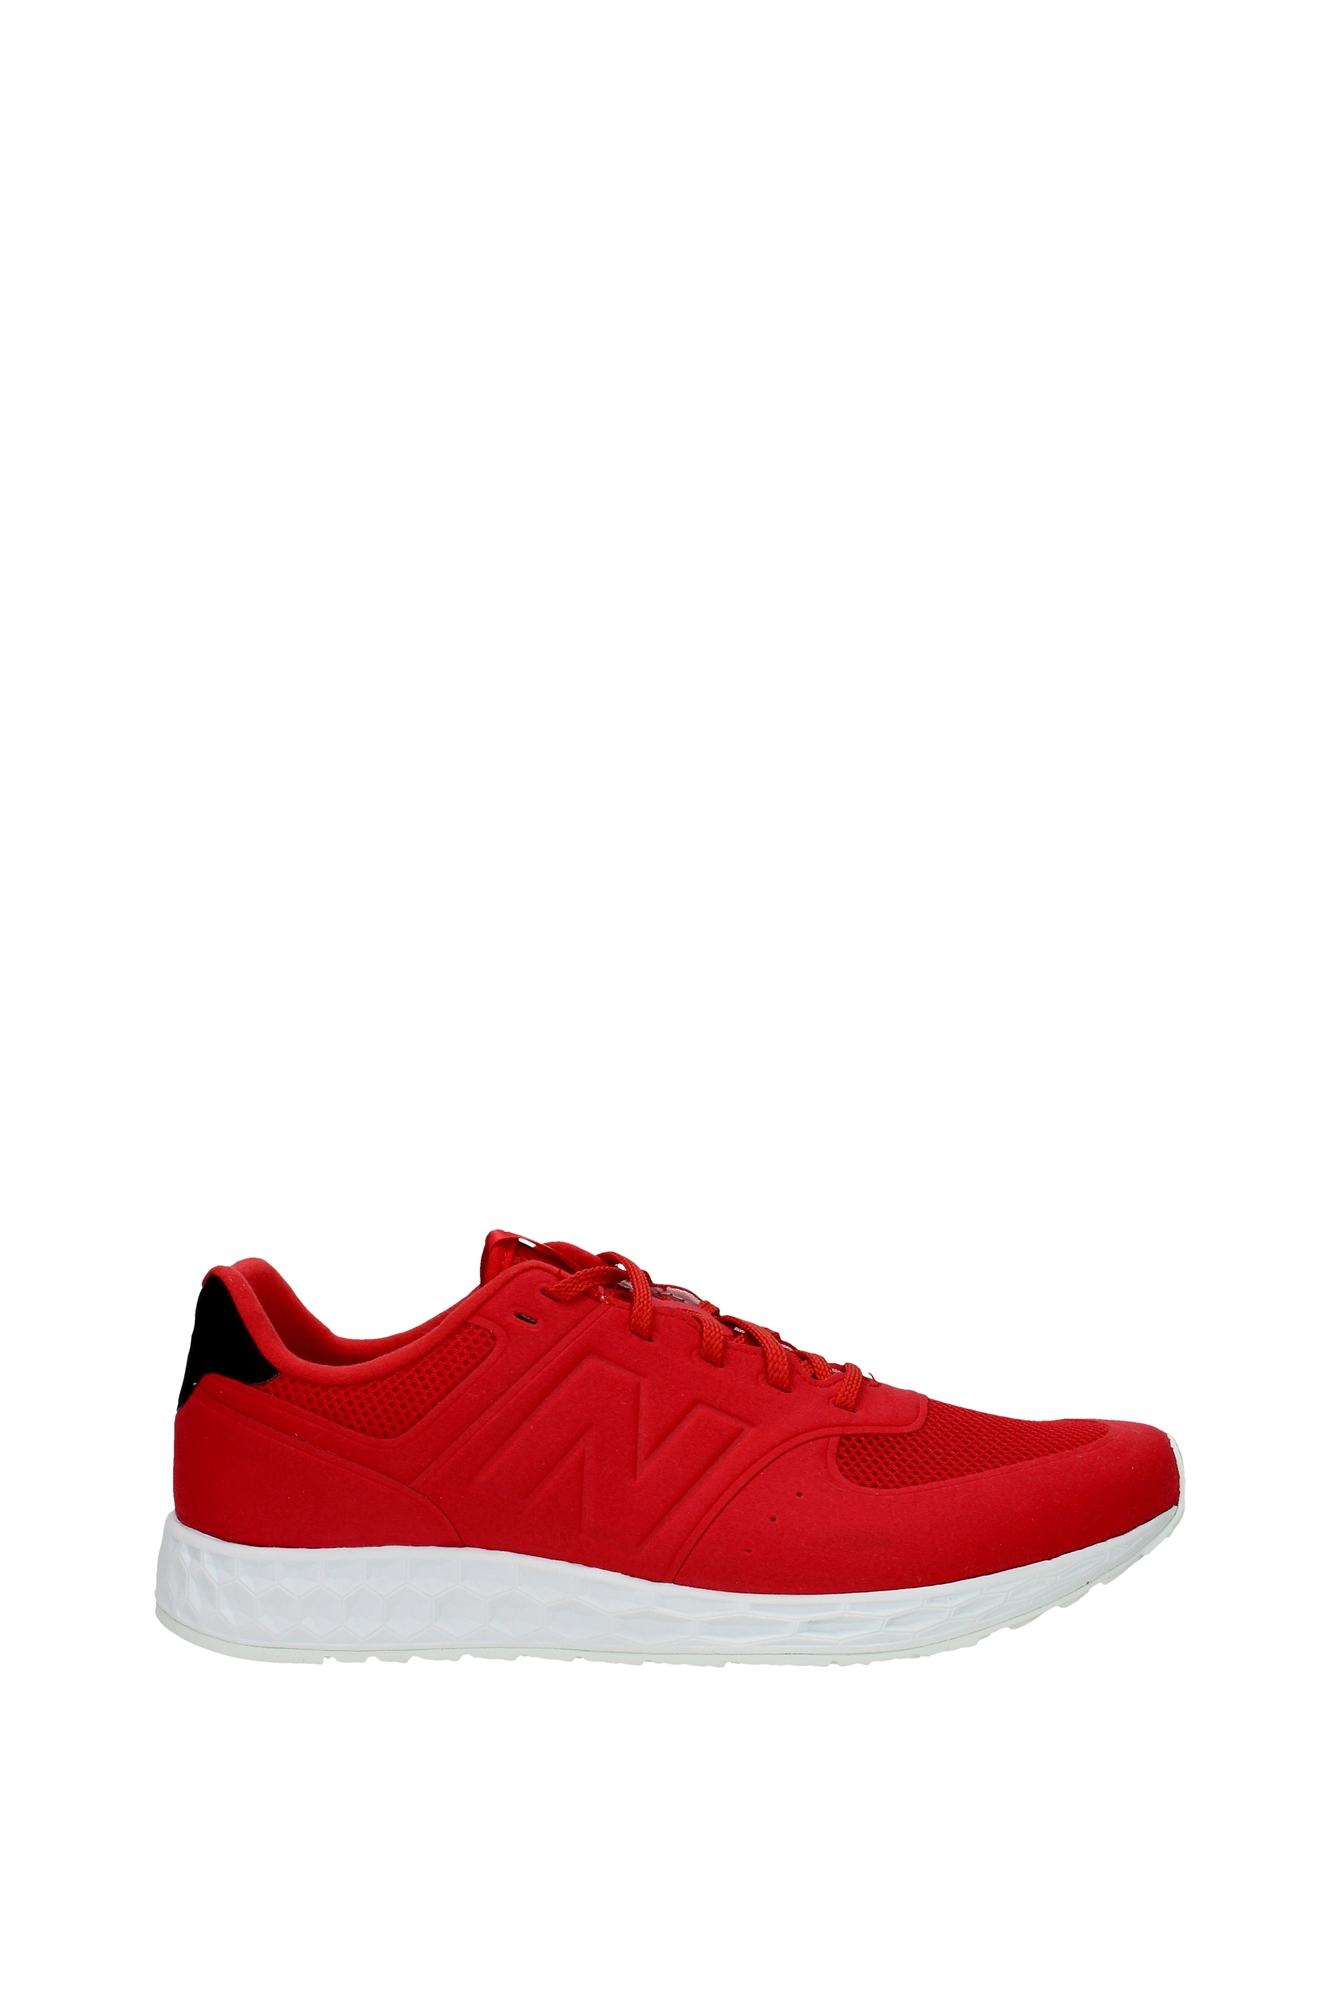 Sneakers New (MFL574RB) Balance Herren - Stoff (MFL574RB) New 3e592b